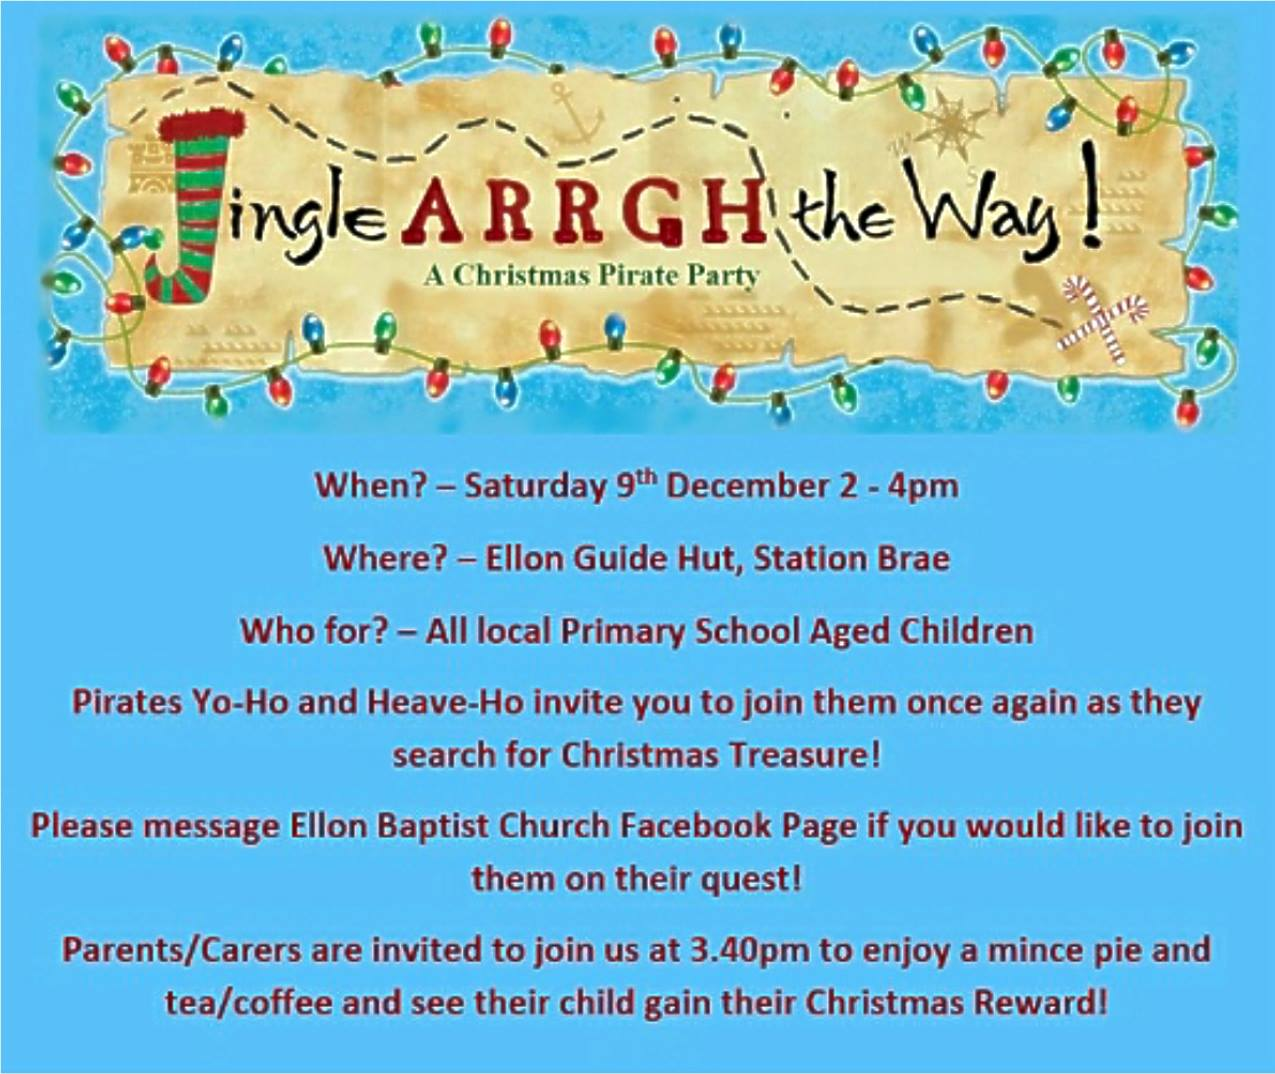 Jingle Arrgh the Way Kids Club - 7th December